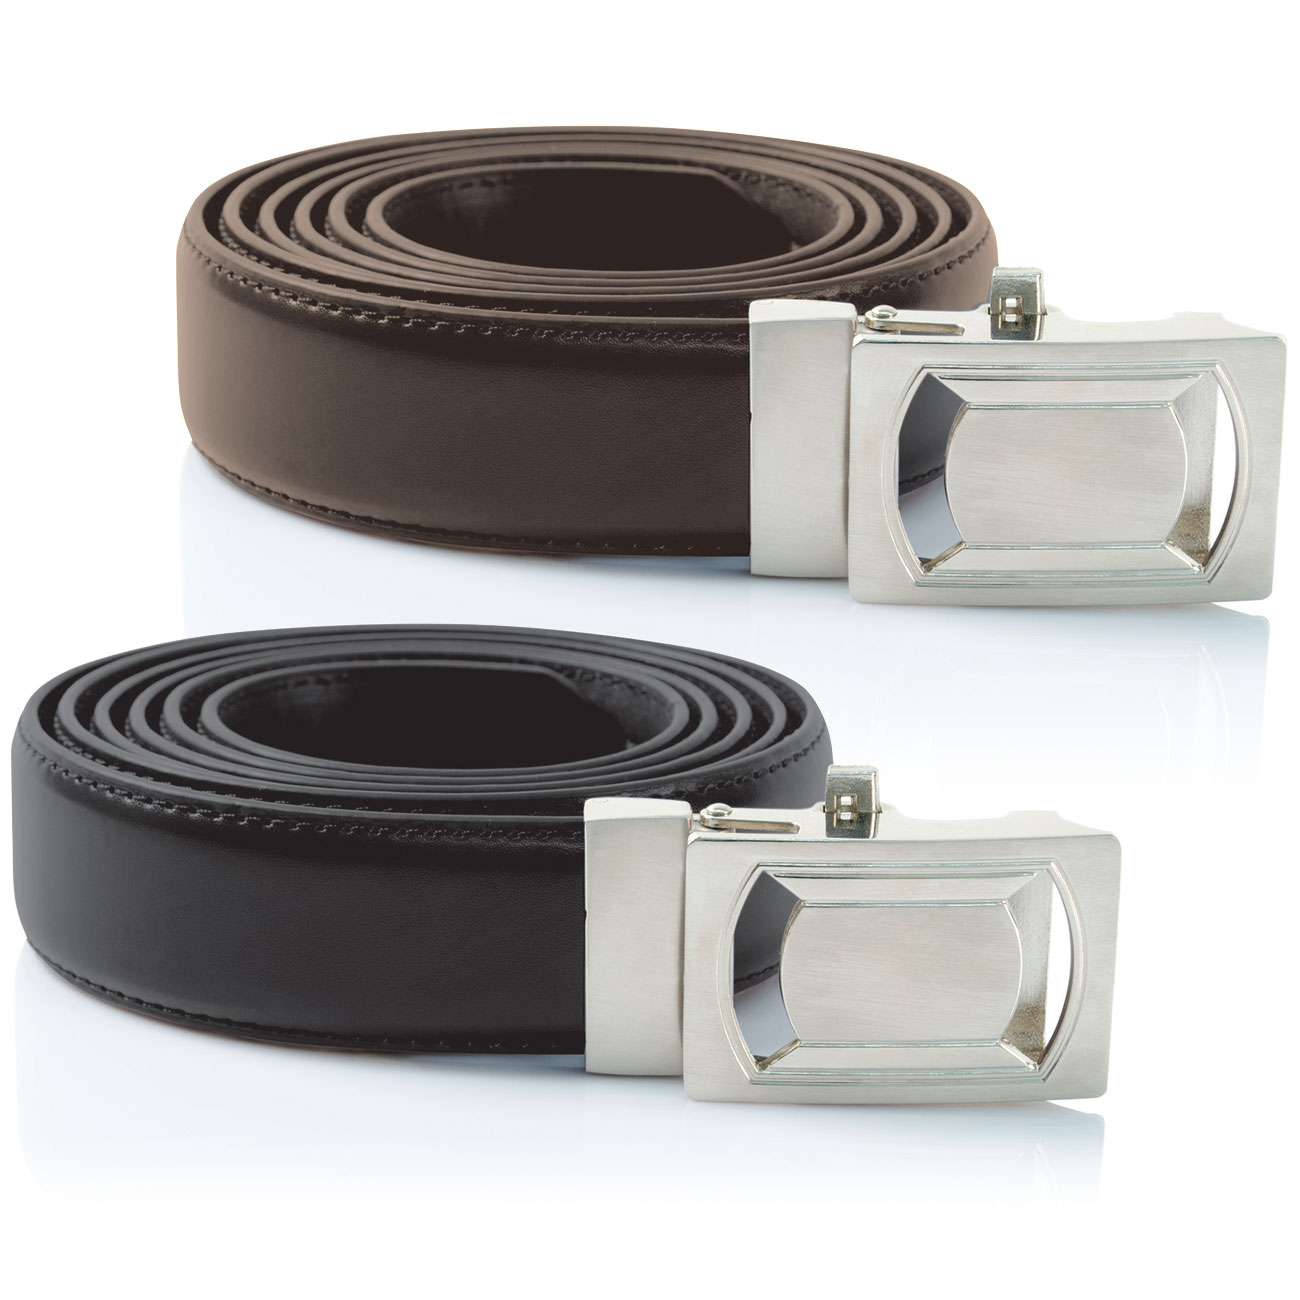 Ideaworks Custom Fit Belts- Black + Brown 2-Pack